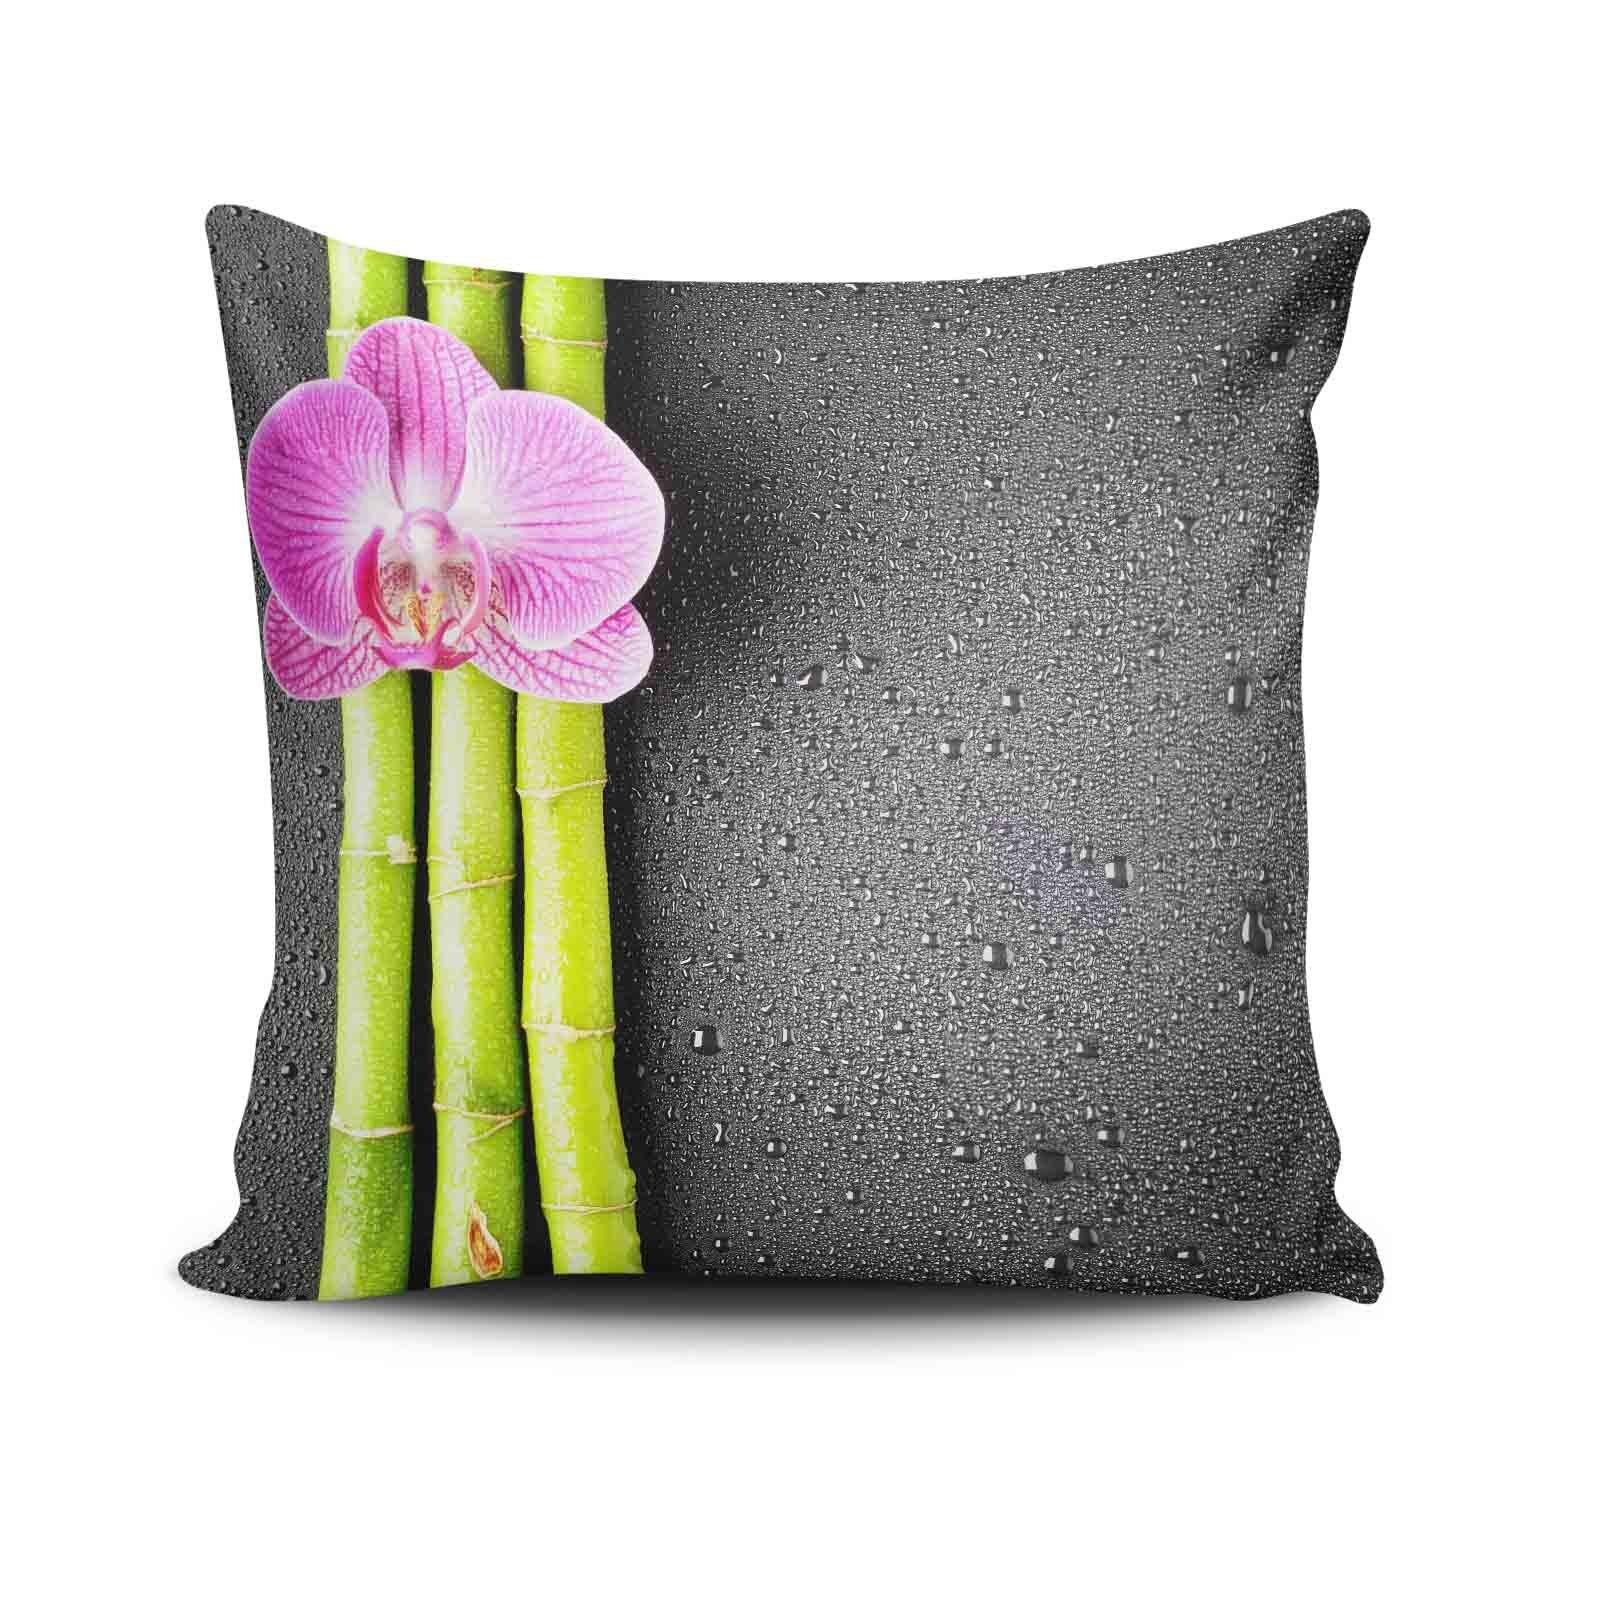 Perna decorativa Cushion Love, Dimensiune: 45 x 45 cm, Material exterior: 50% bumbac / 50% poliester 768CLV0132